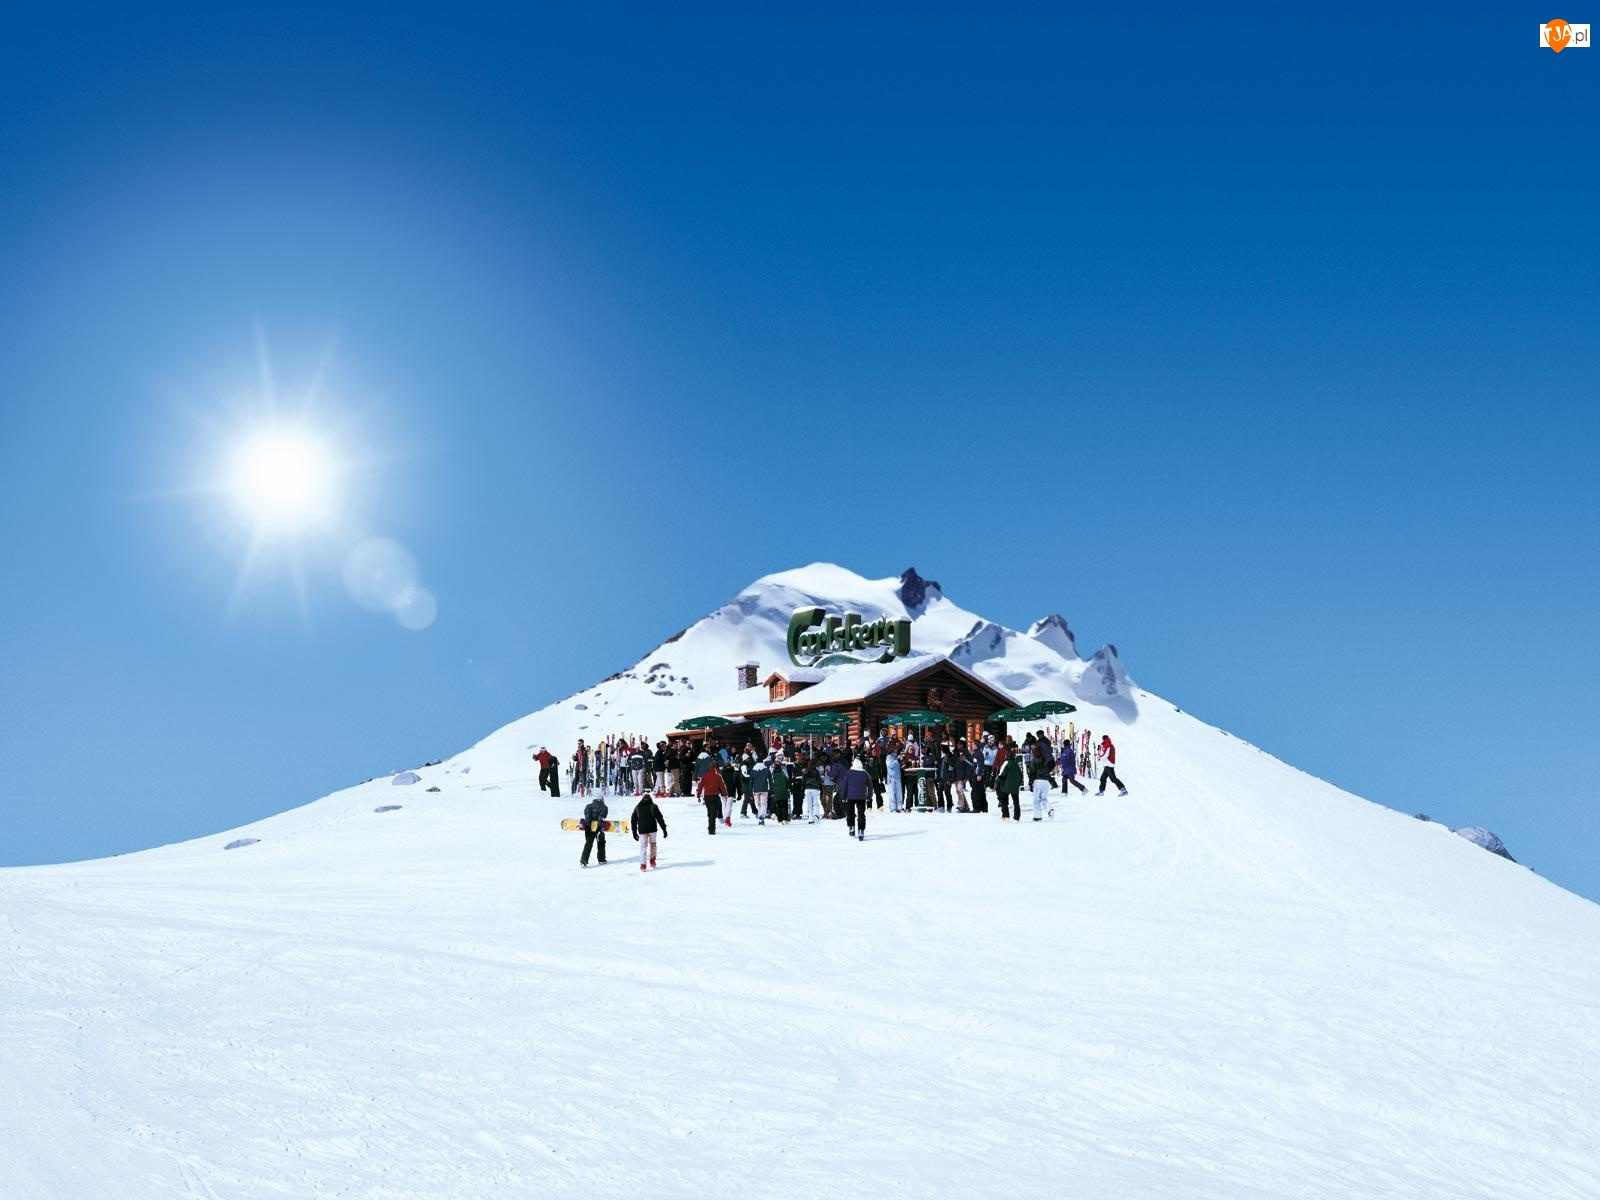 Piwo, Śnieg, Calsberg, Góry